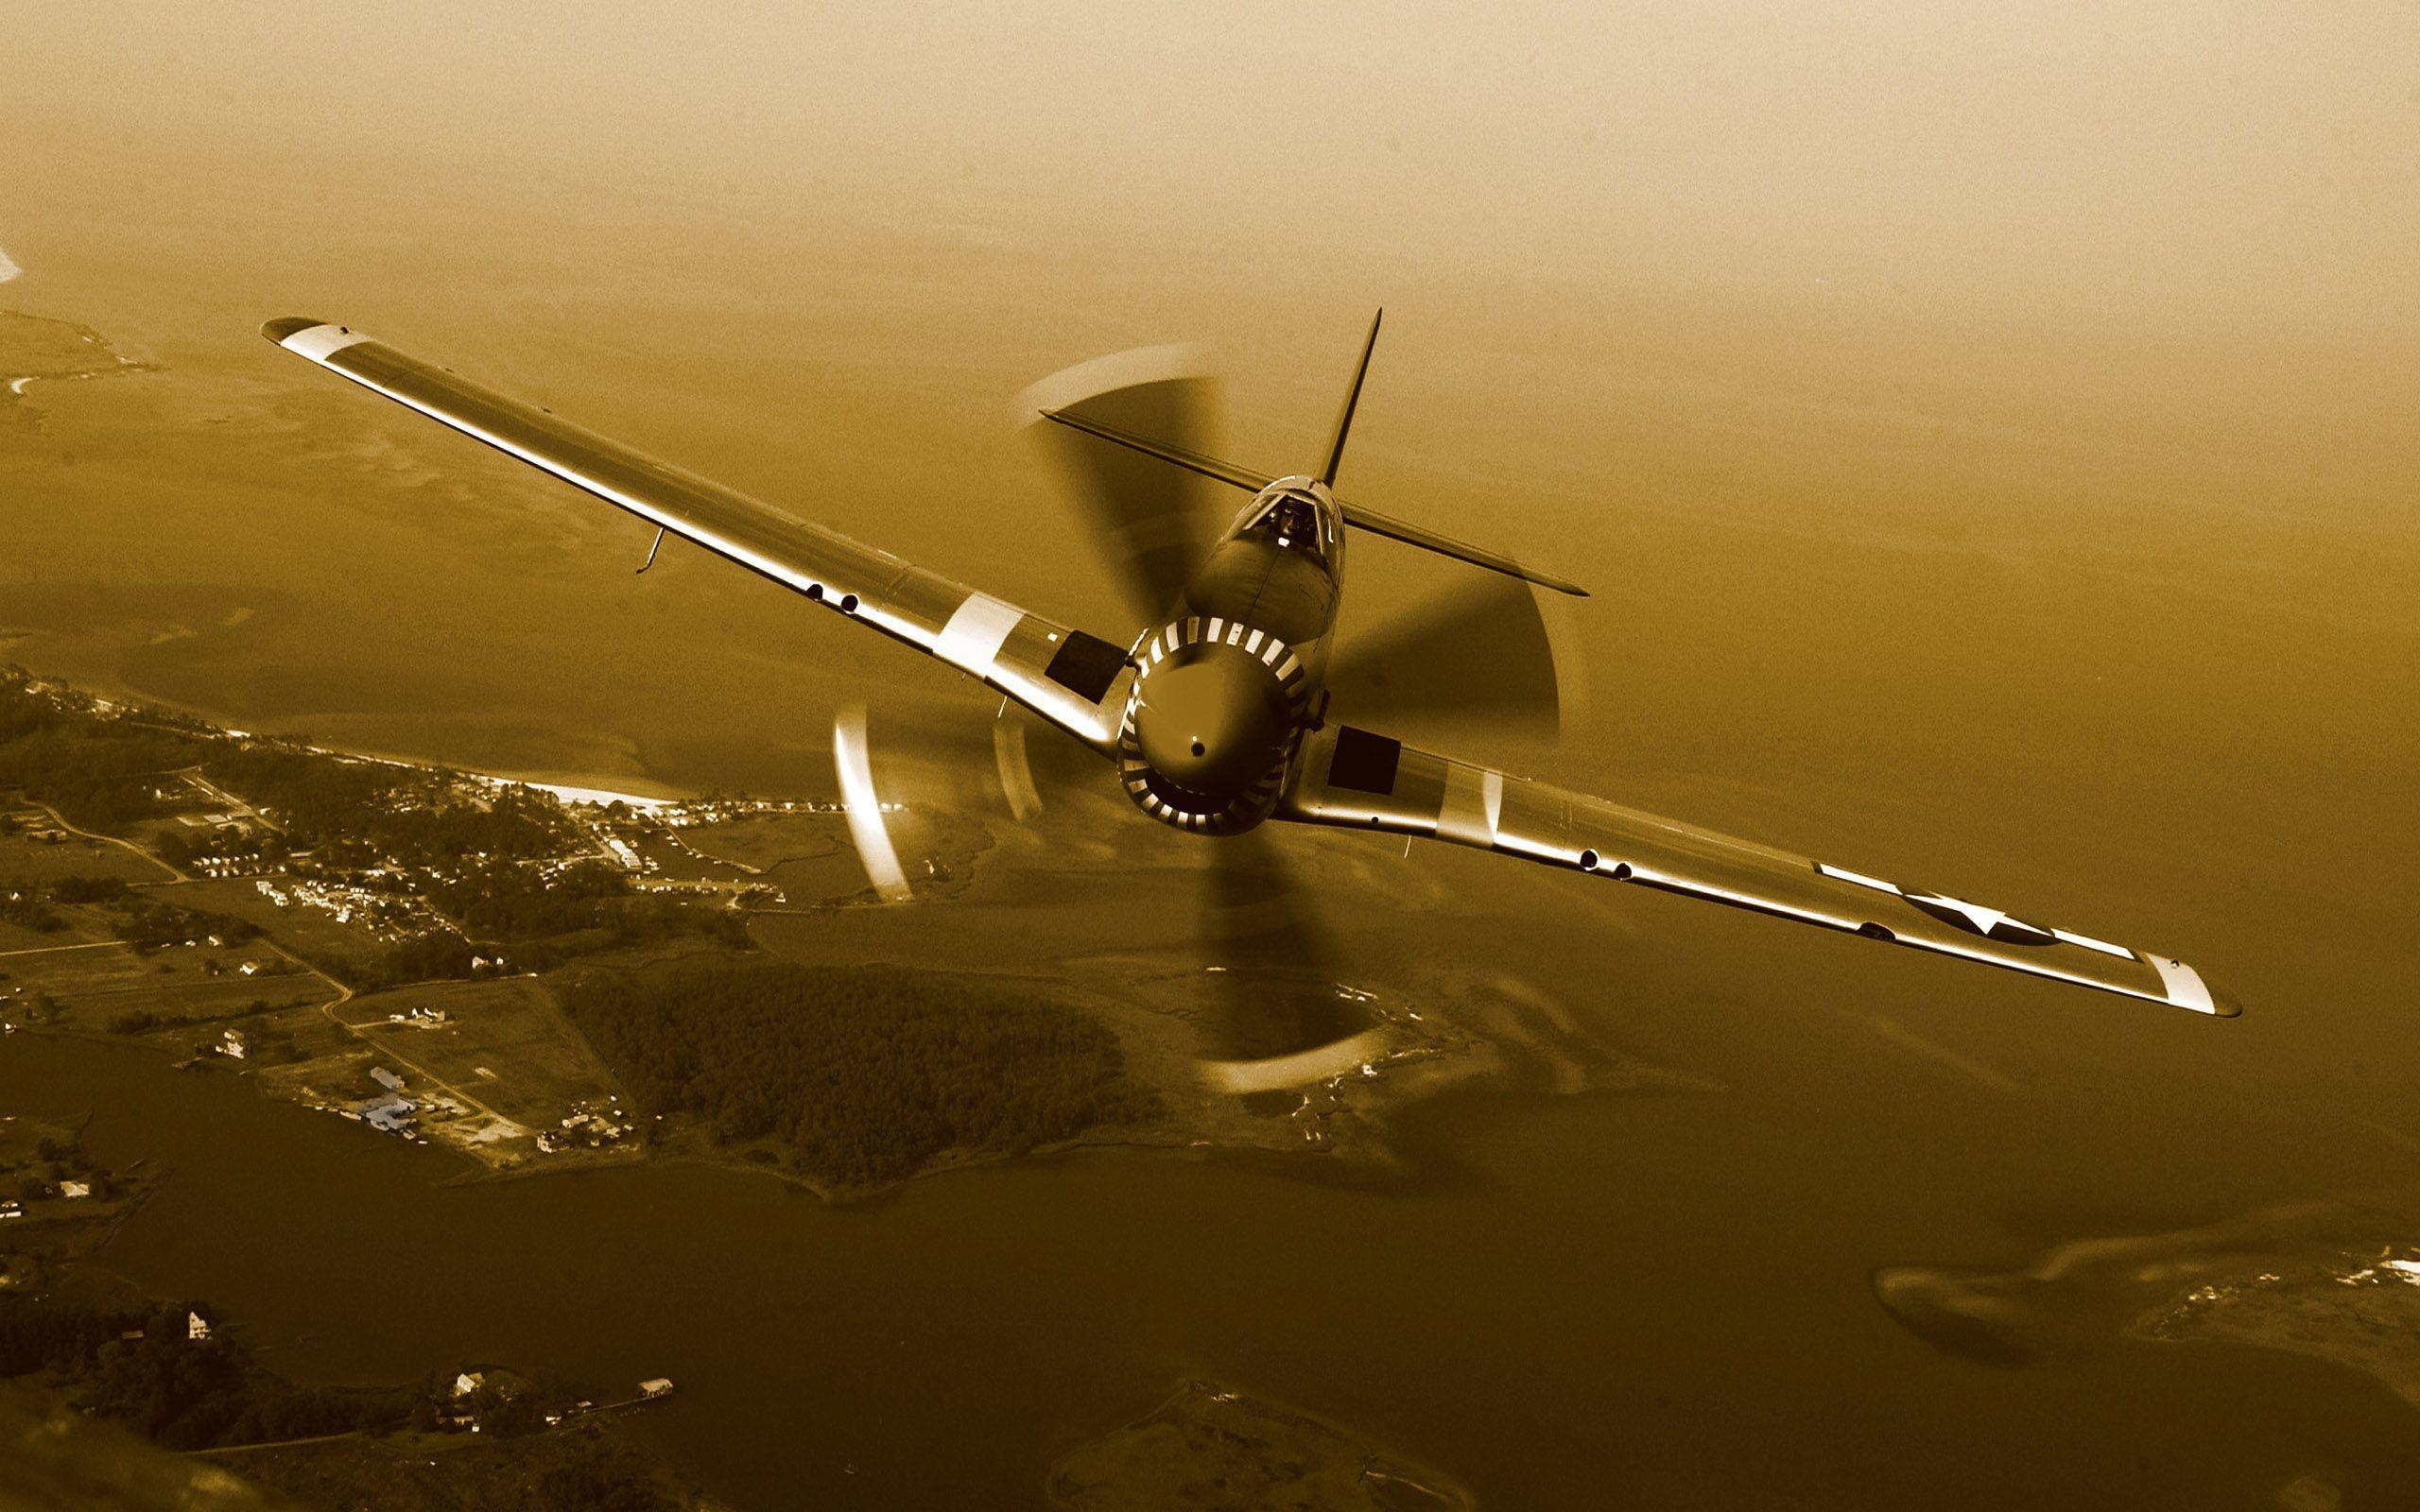 Vintage Aircraft Weekend at Paine Field - This Weekend ... |Vintage Jet Planes